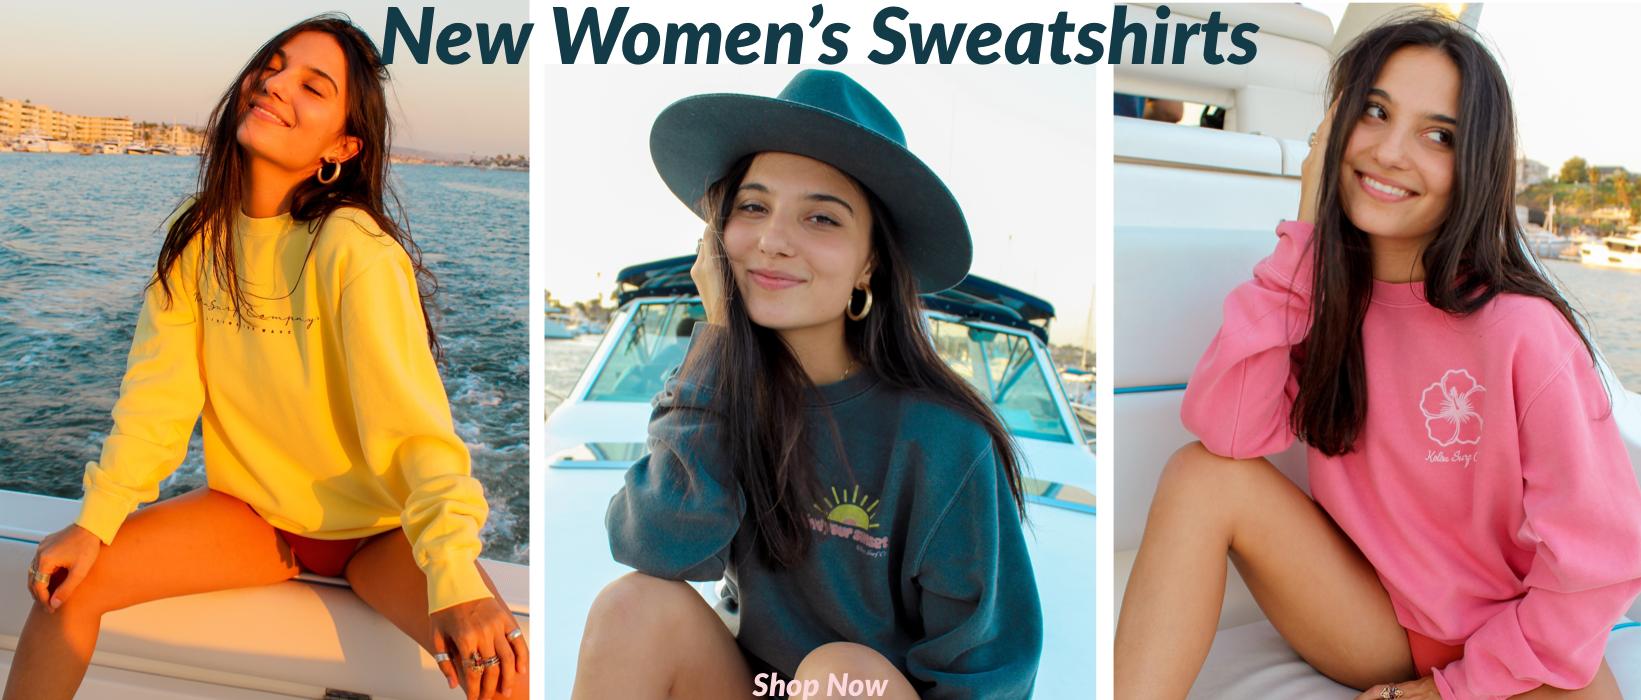 New Women's Sweatshirts